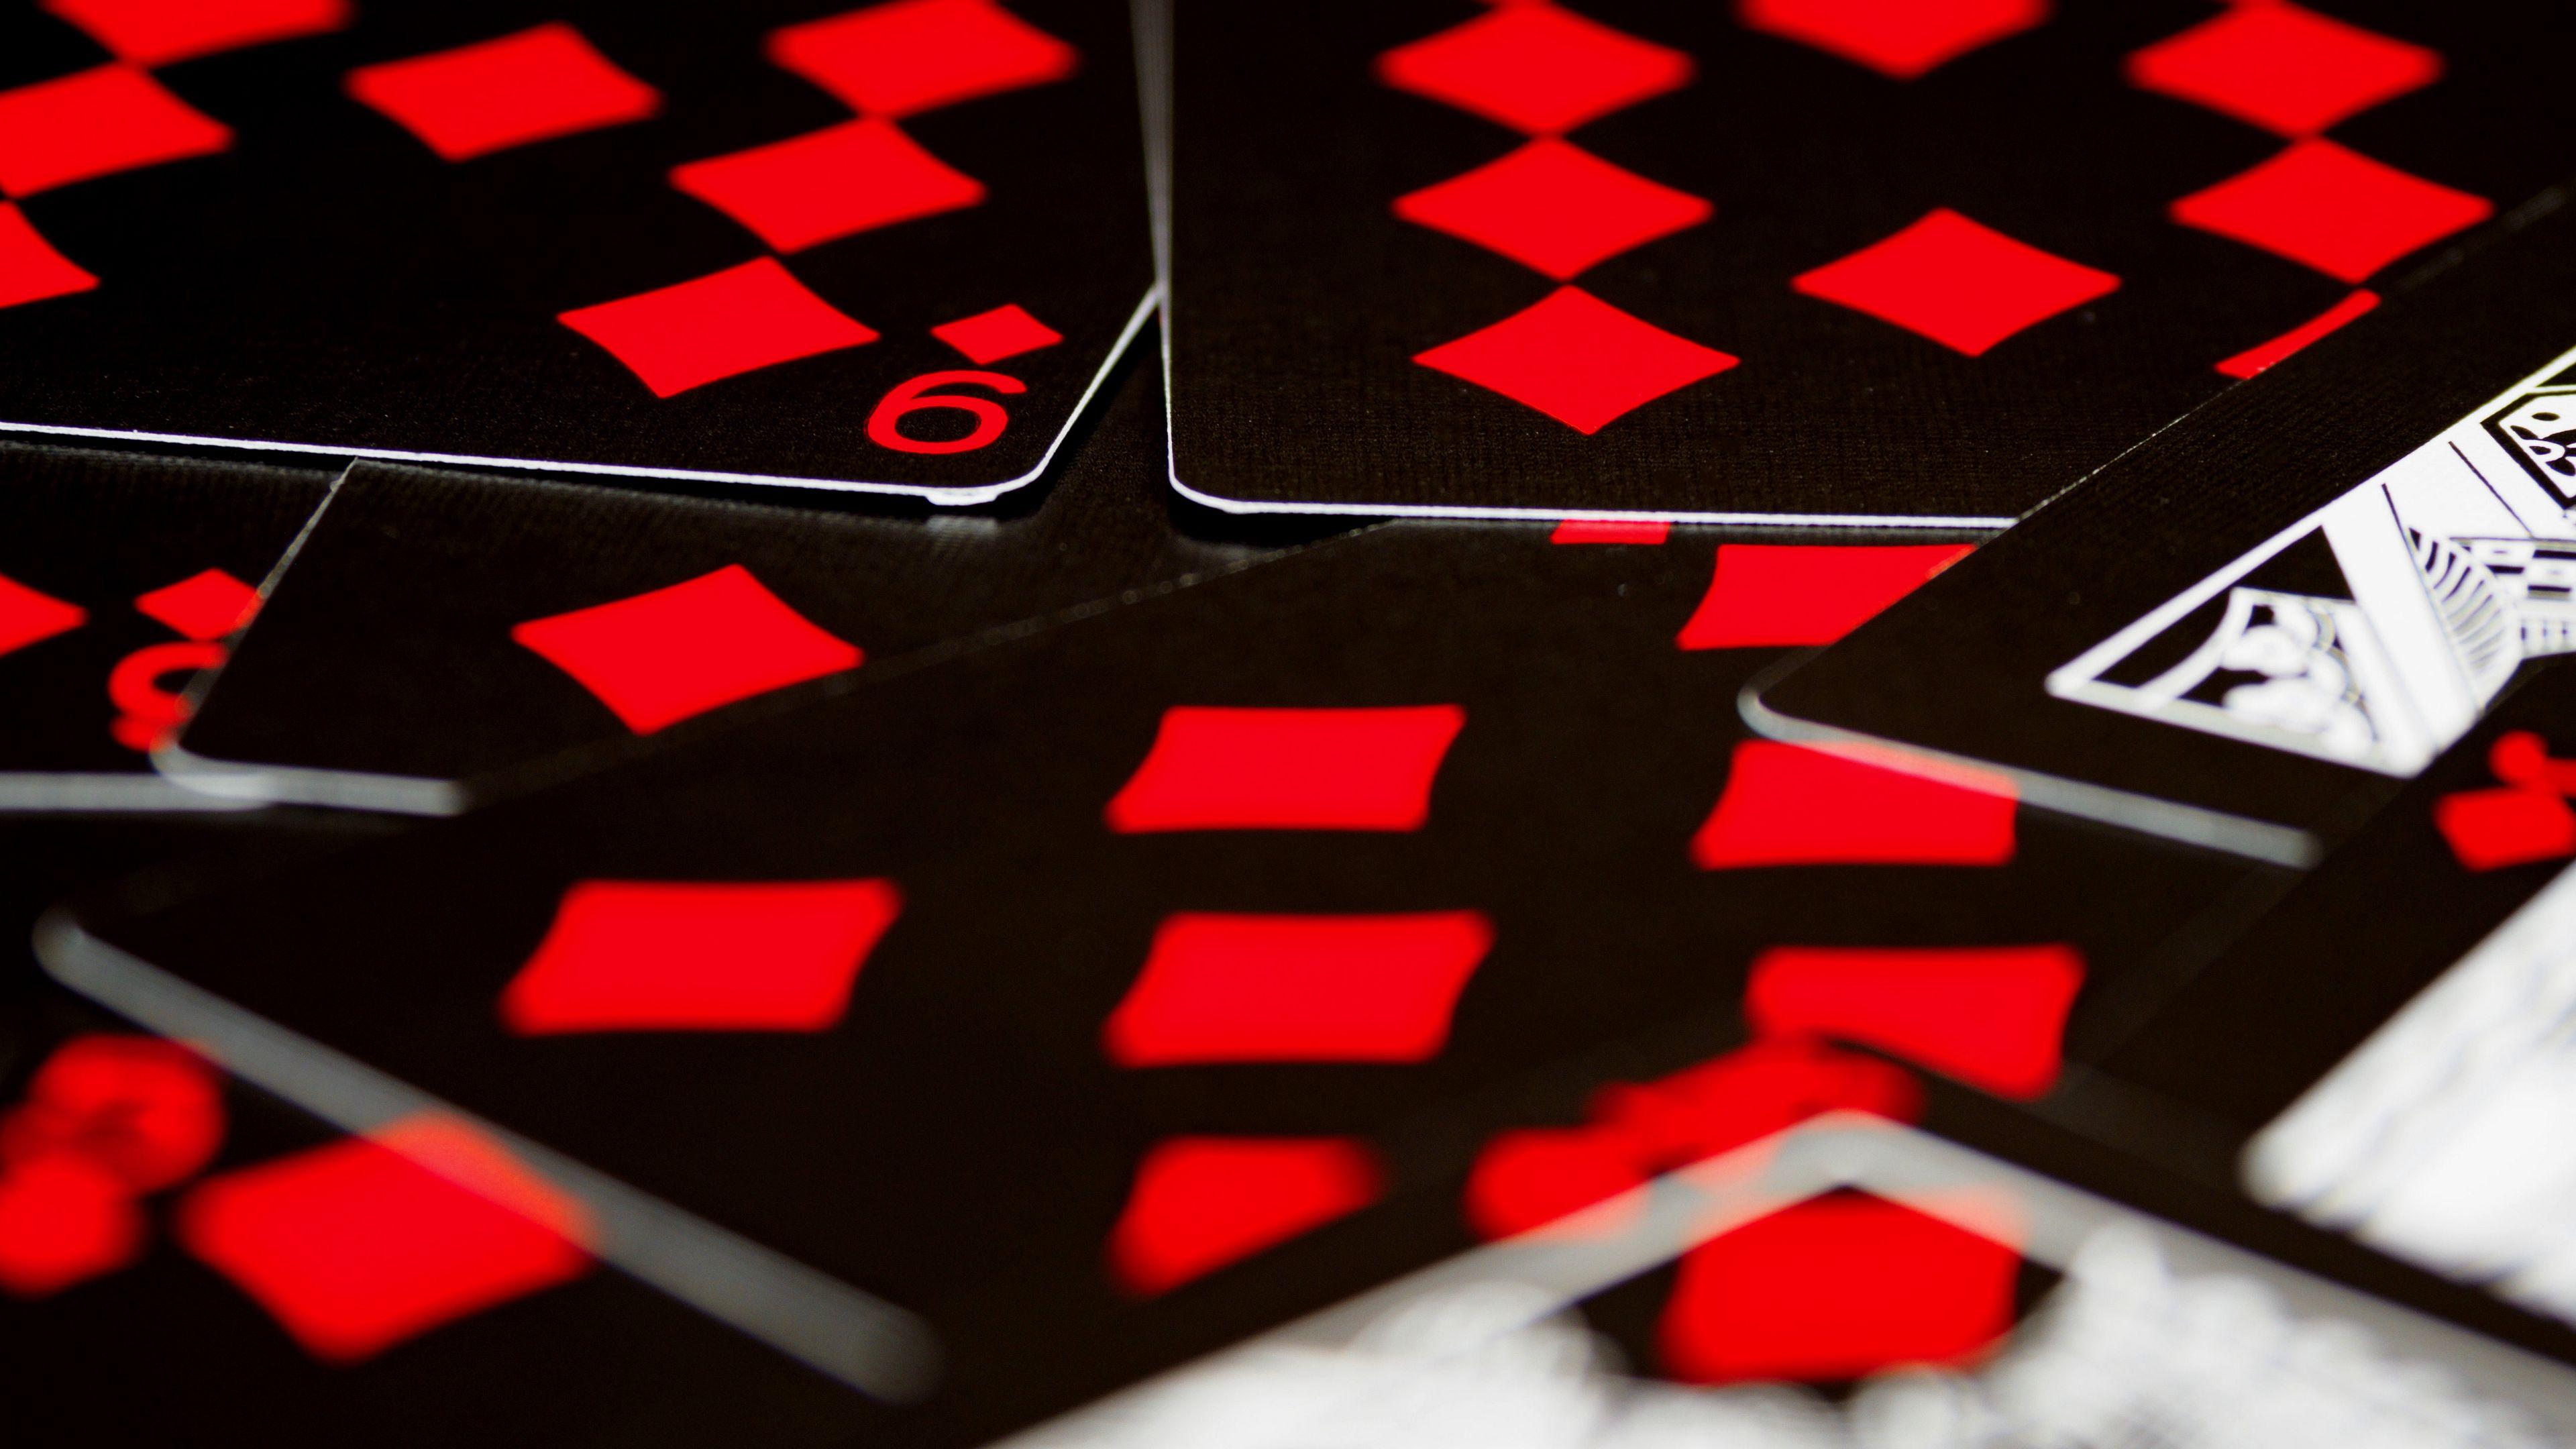 3840x2160 Wallpaper playing cards, game, gaming, red, black